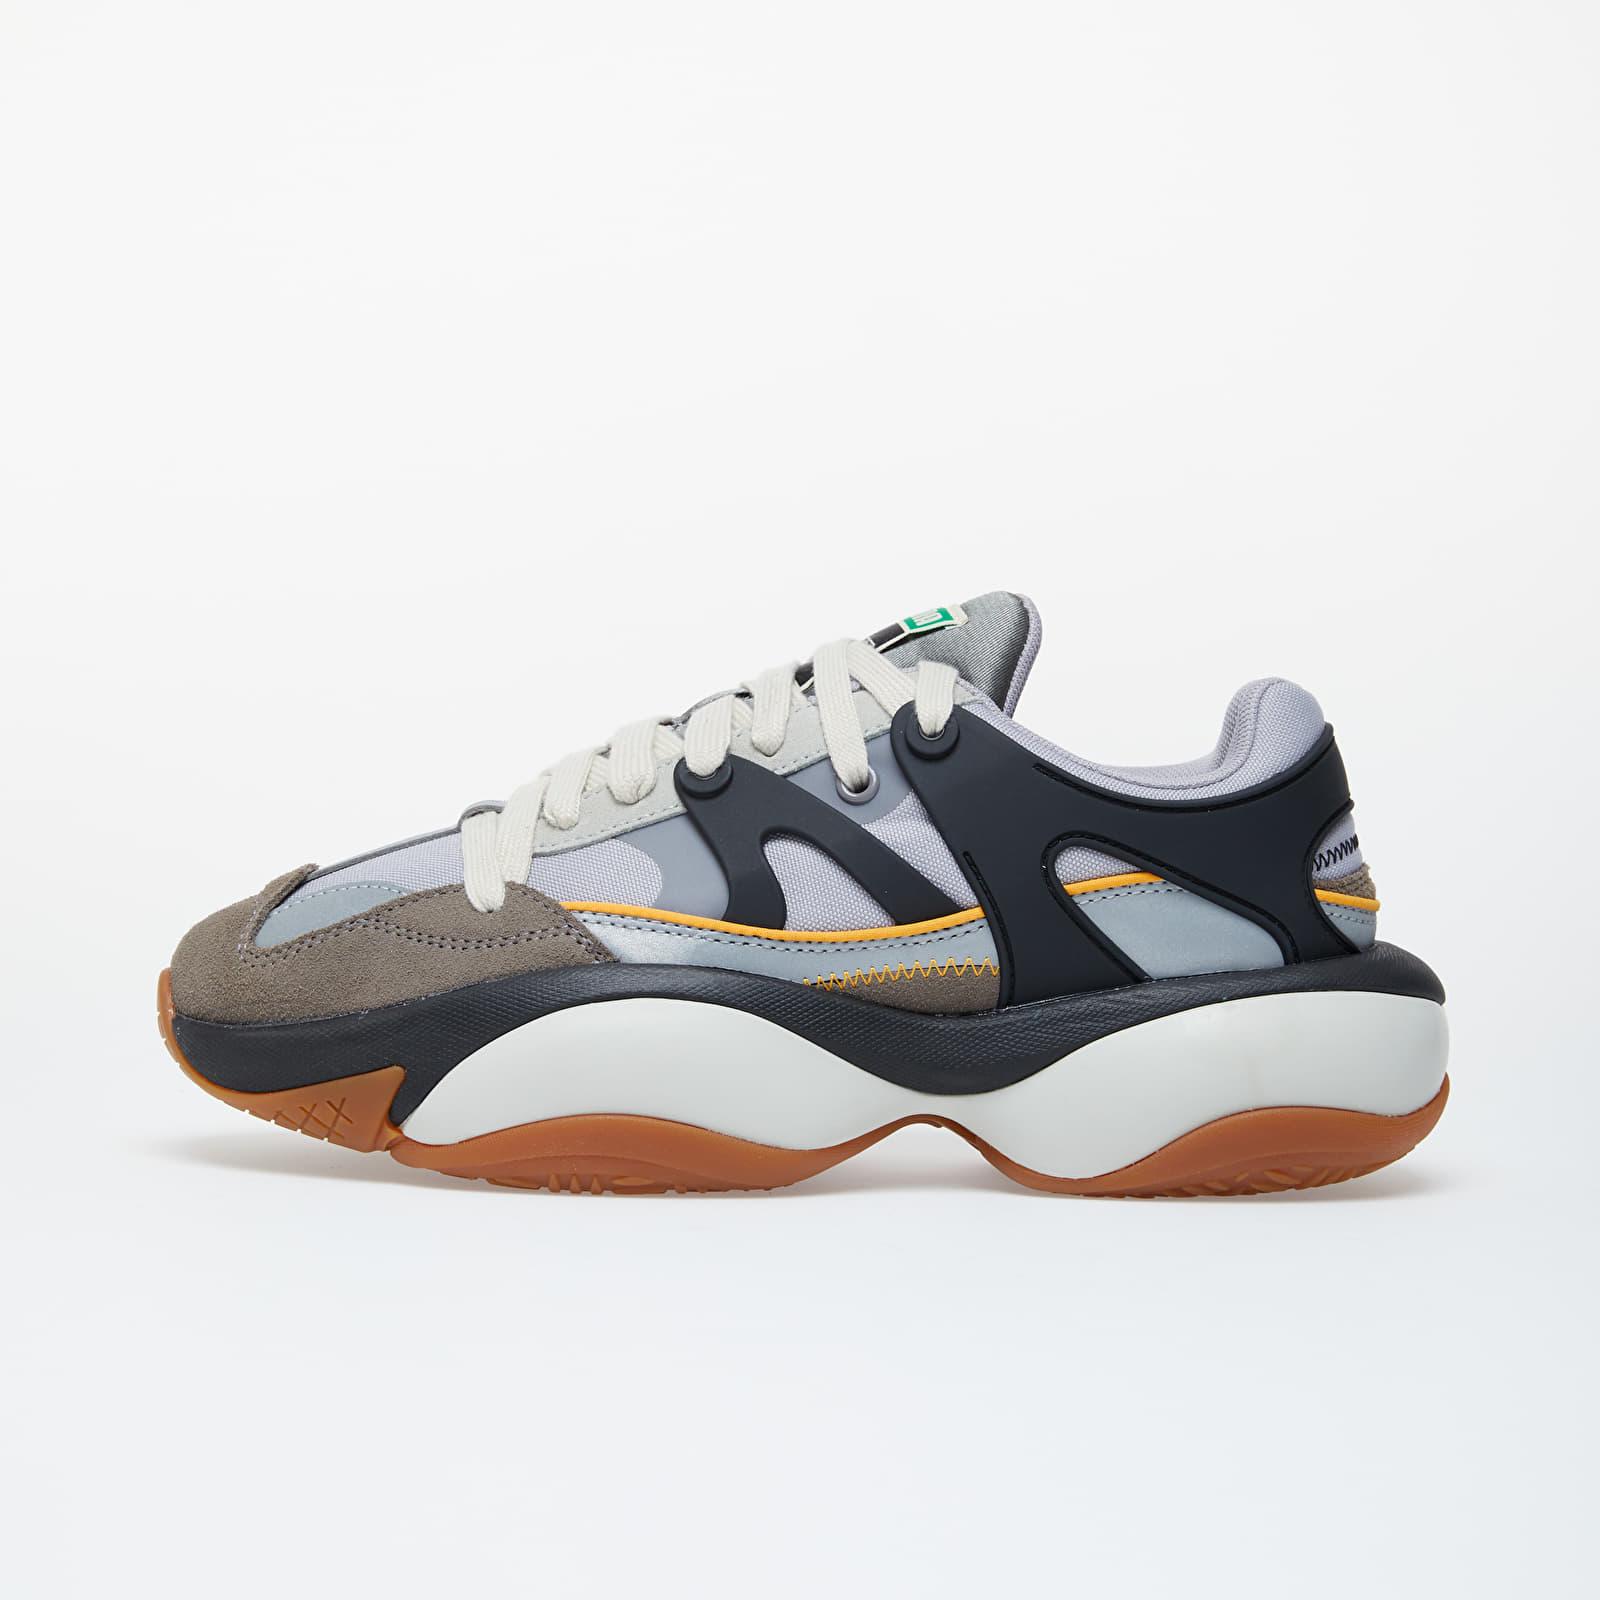 Férfi cipők Puma x Rhude Alteration Nu Steel Gray-Drizzle